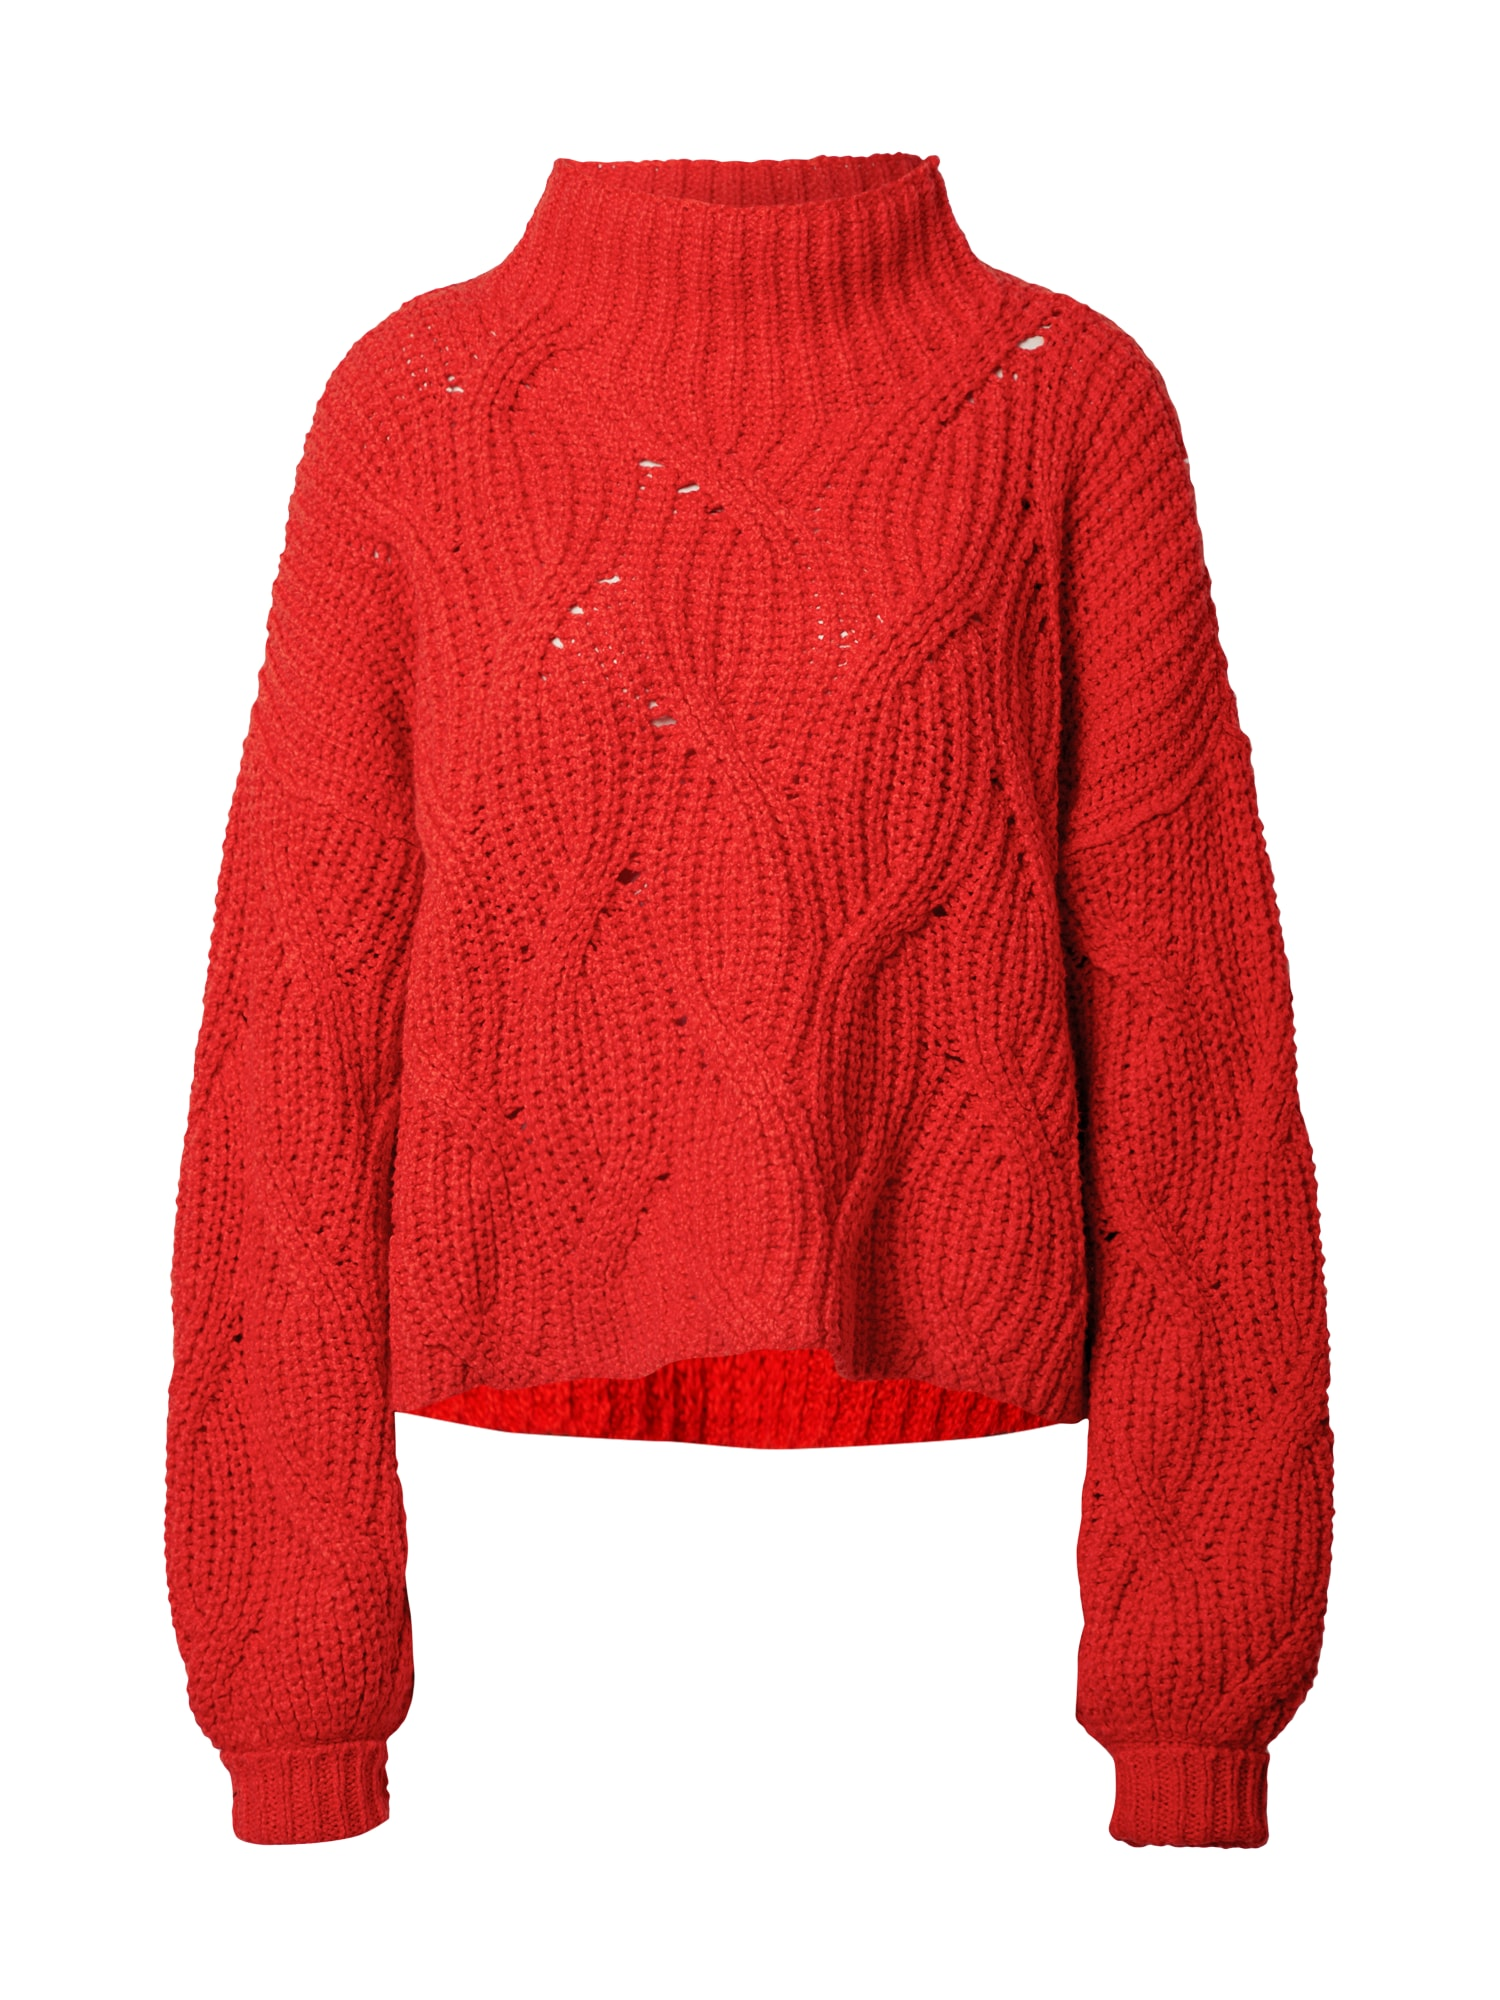 Free People Megztinis raudona